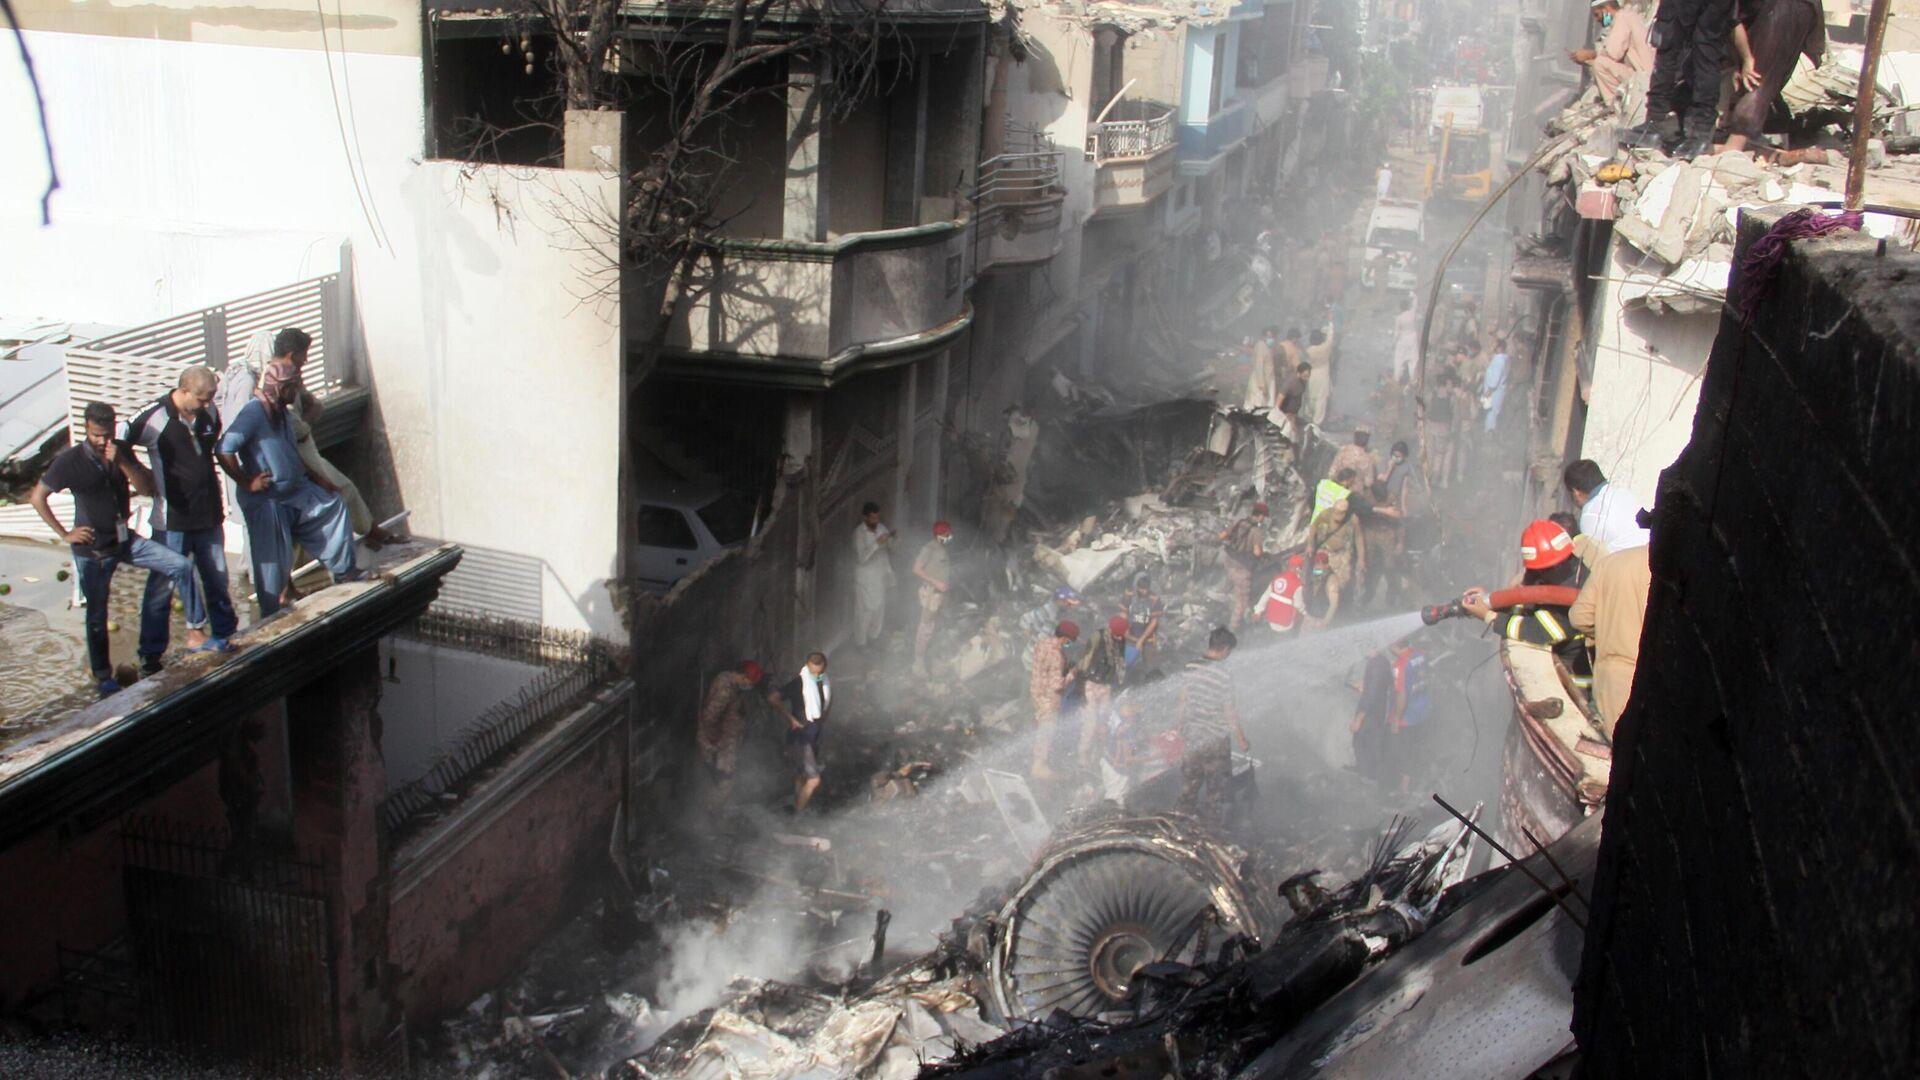 Разбор завалов и тушение пожара на месте крушения пассажирского самолета Airbus A-320 авиакомпании Pakistan International Airlines (PIA) в Карачи - РИА Новости, 1920, 09.01.2021